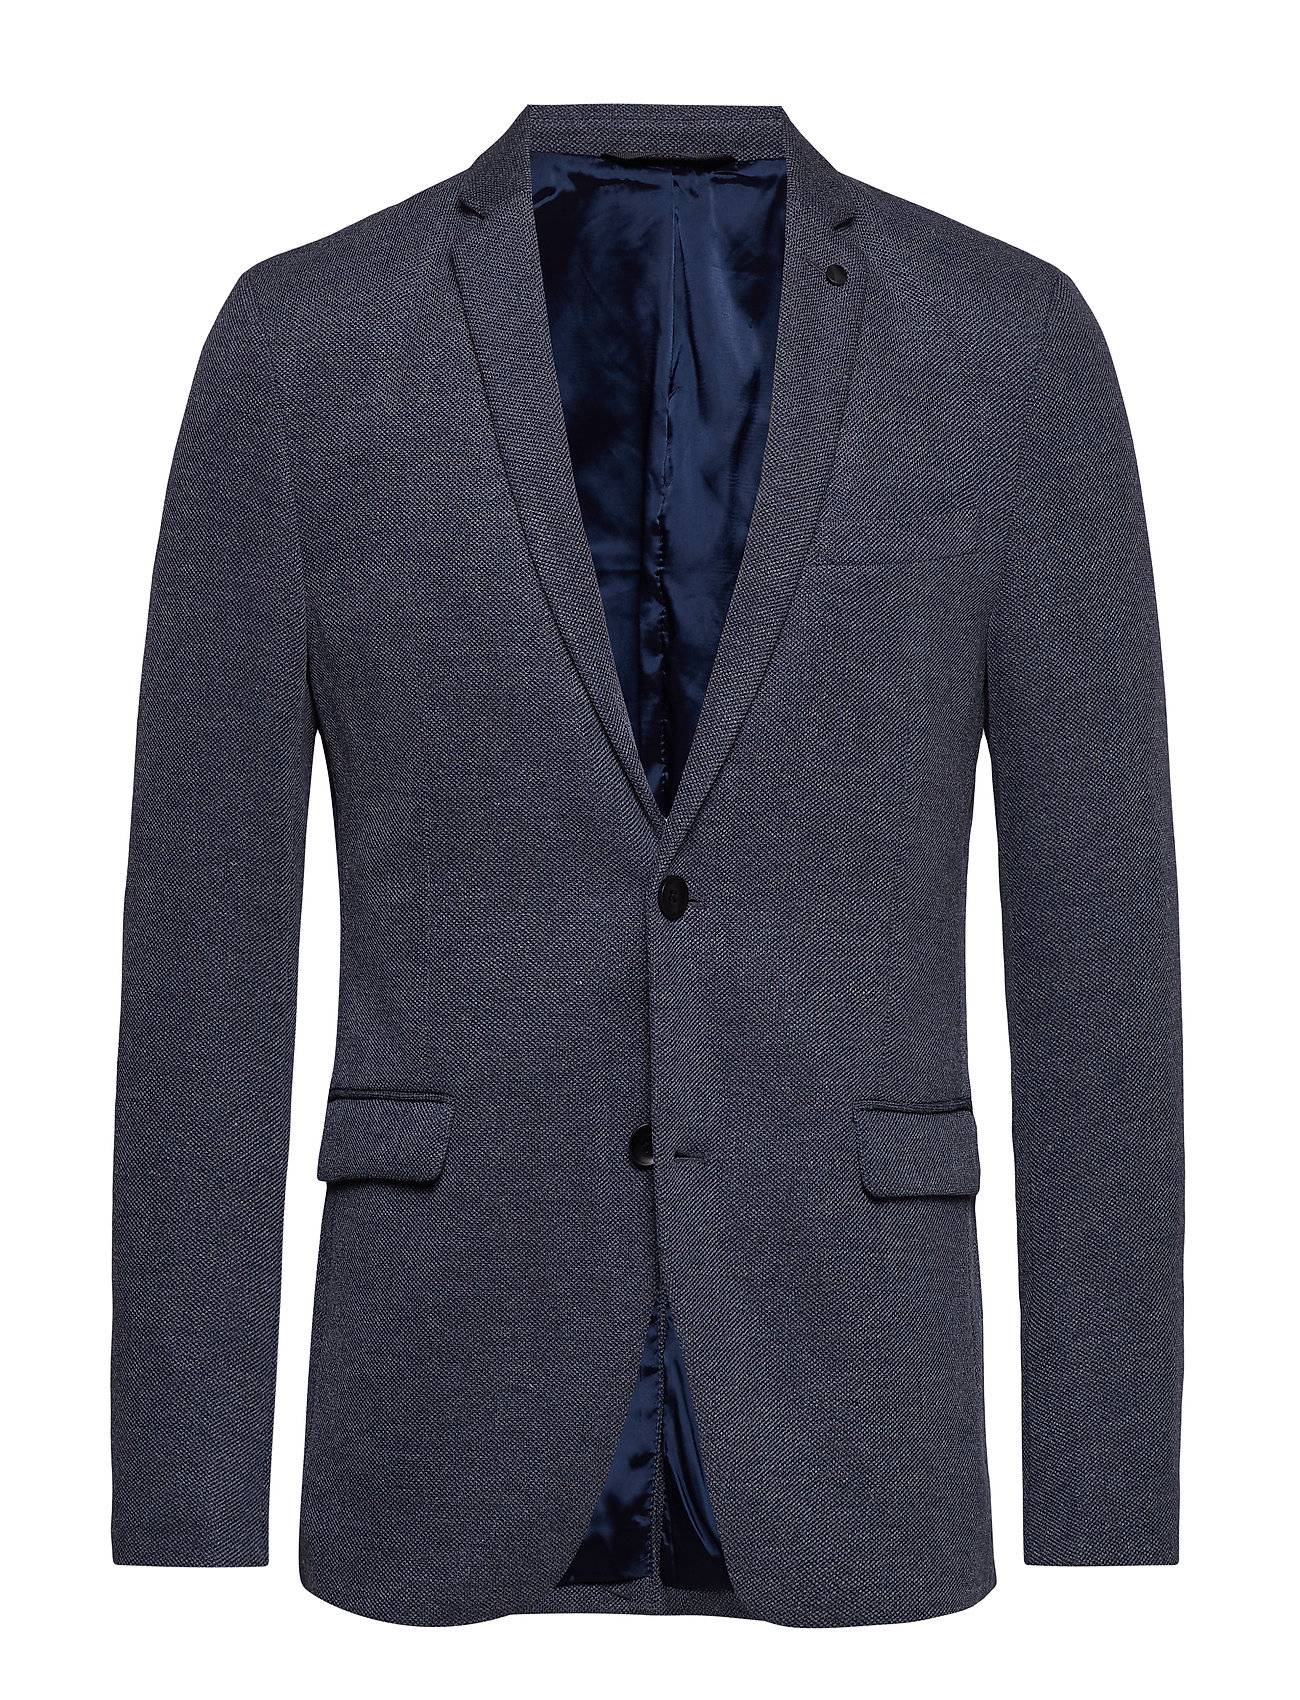 Image of Esprit Casual Blazers Knitted Bleiseri Puvun Takki Sininen Esprit Casual